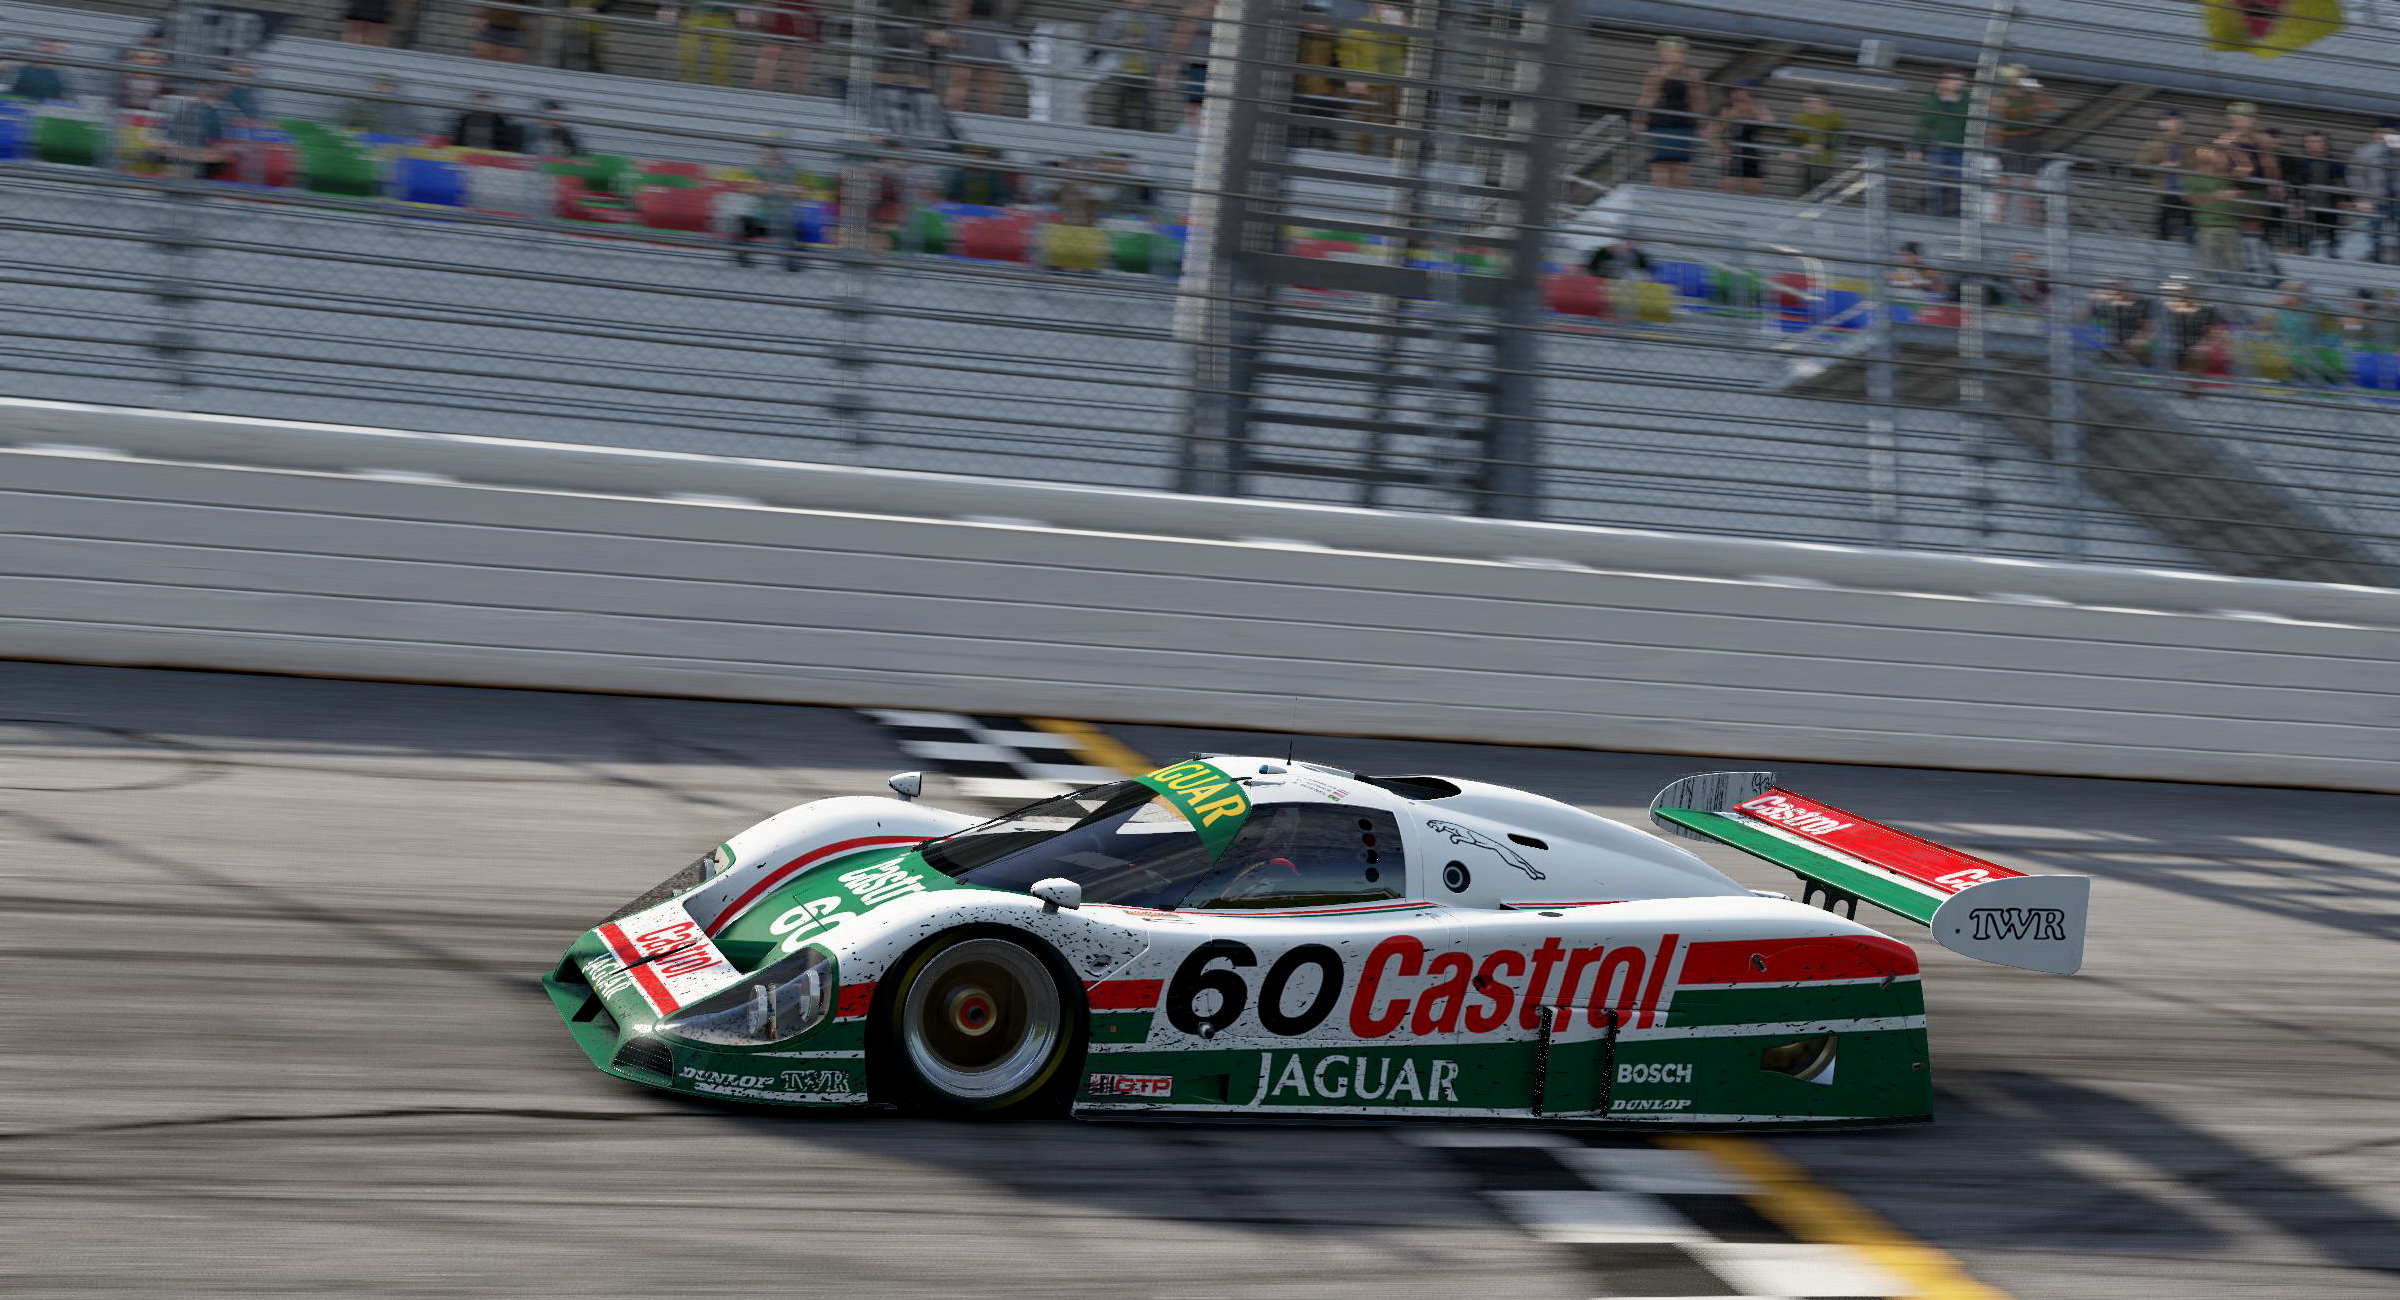 'Castrol' Jaguar Daytona 24 Hours CC.jpg